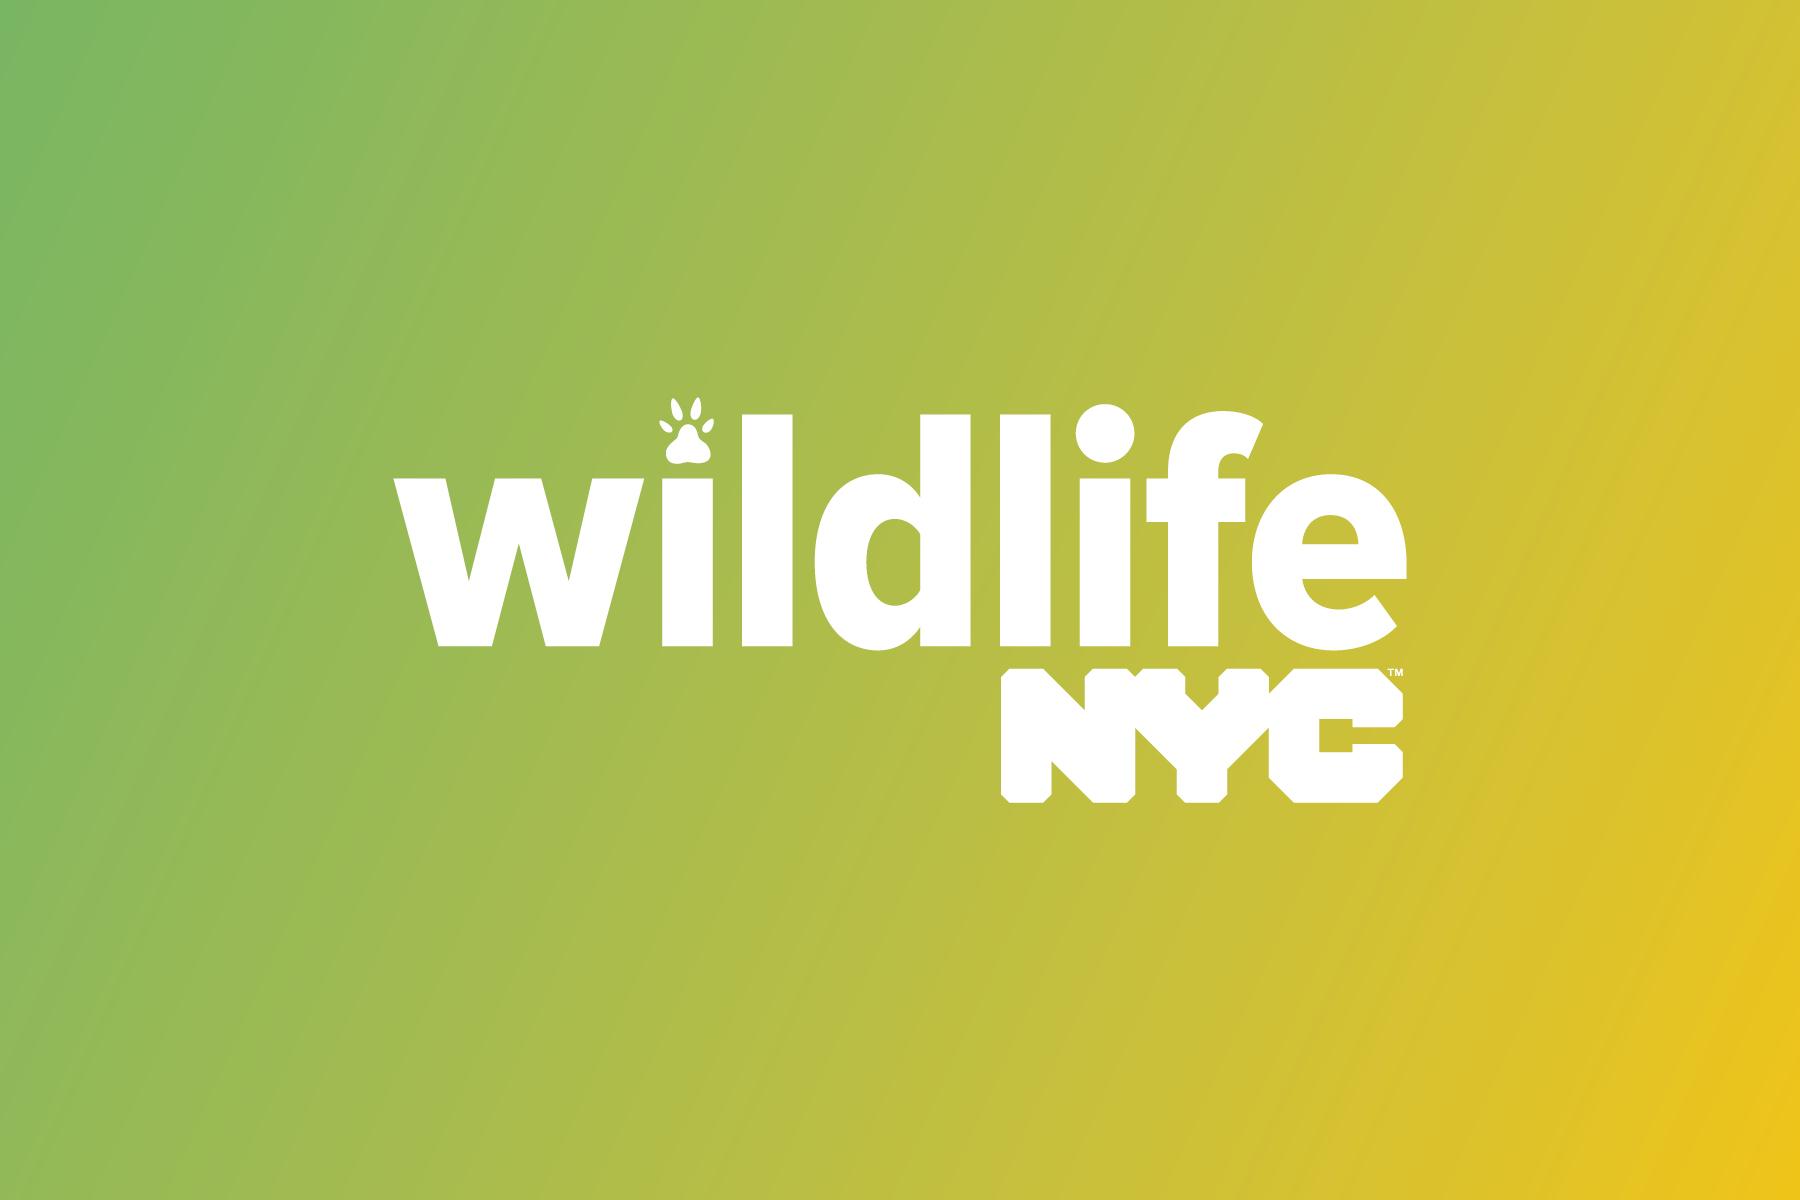 Wildlife NYC - Hayan Ava Design